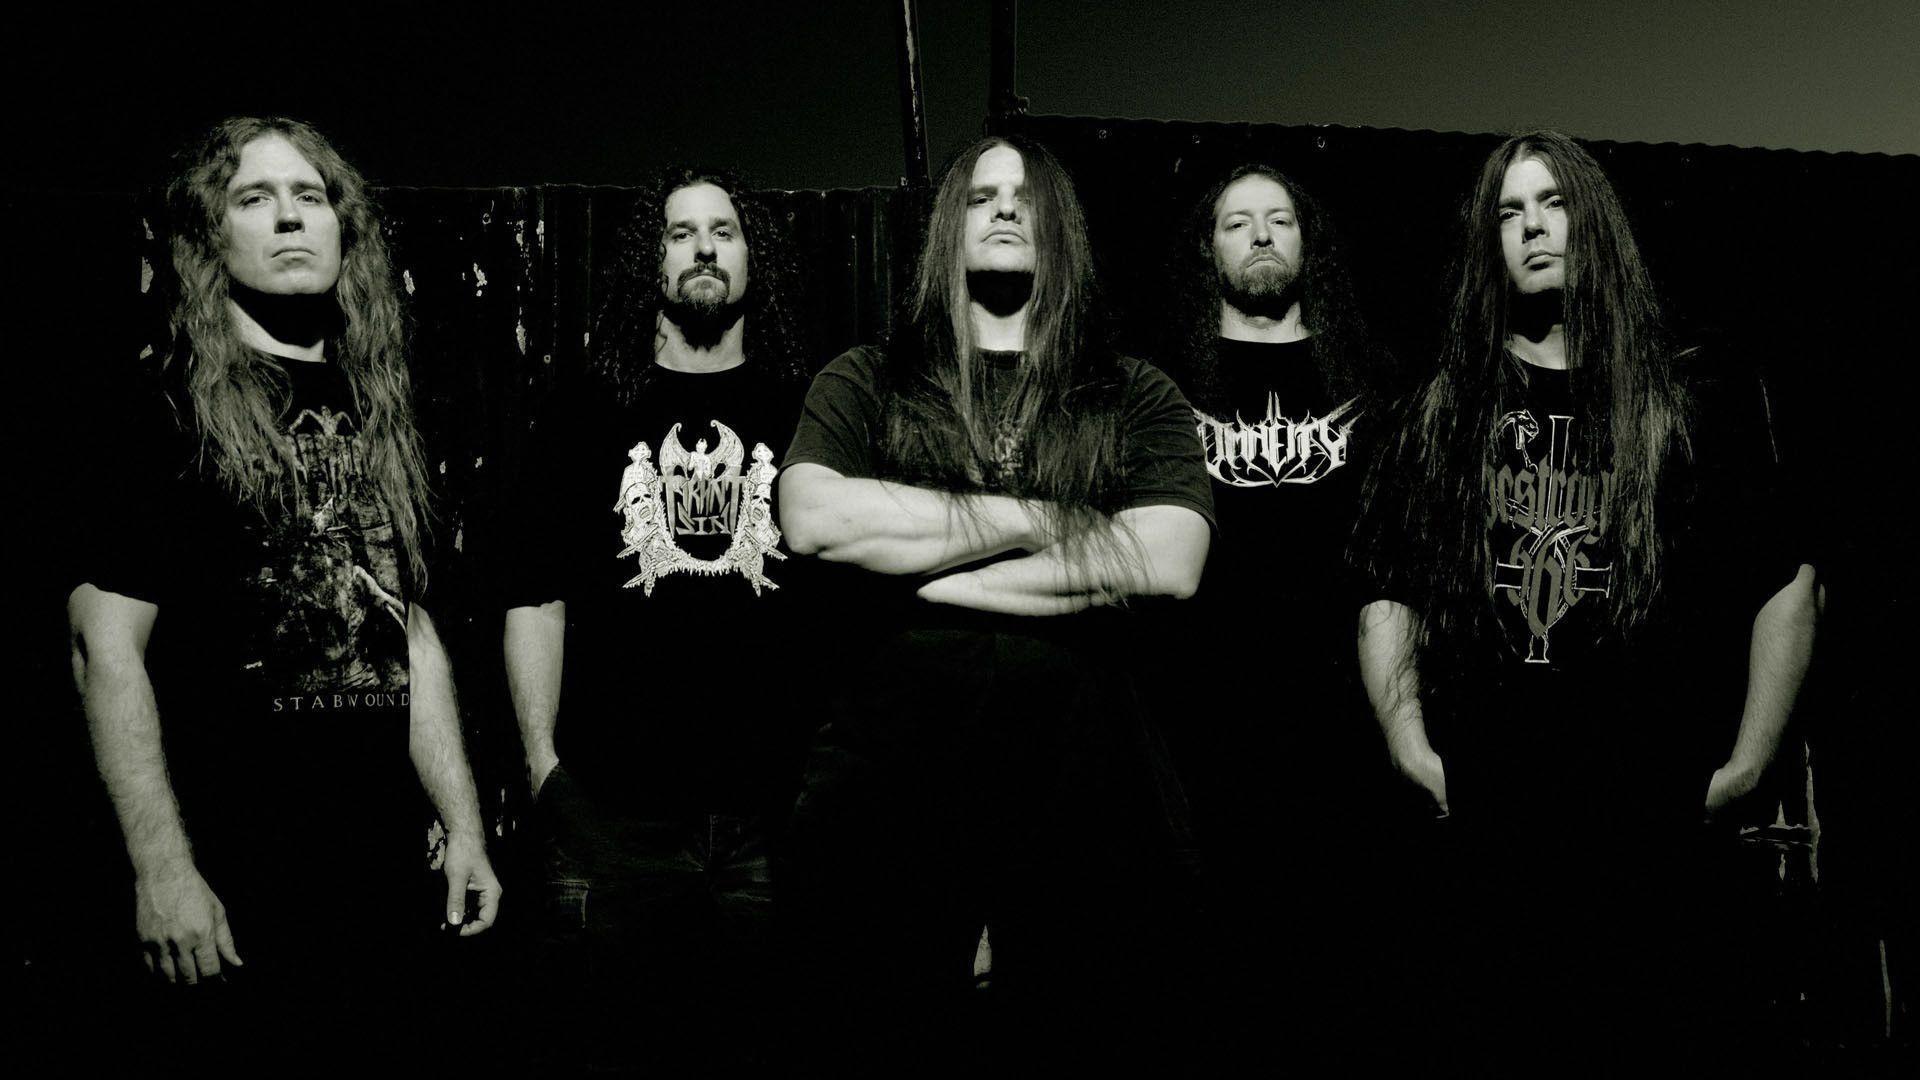 Metal Music Wallpaper 57 Pictures